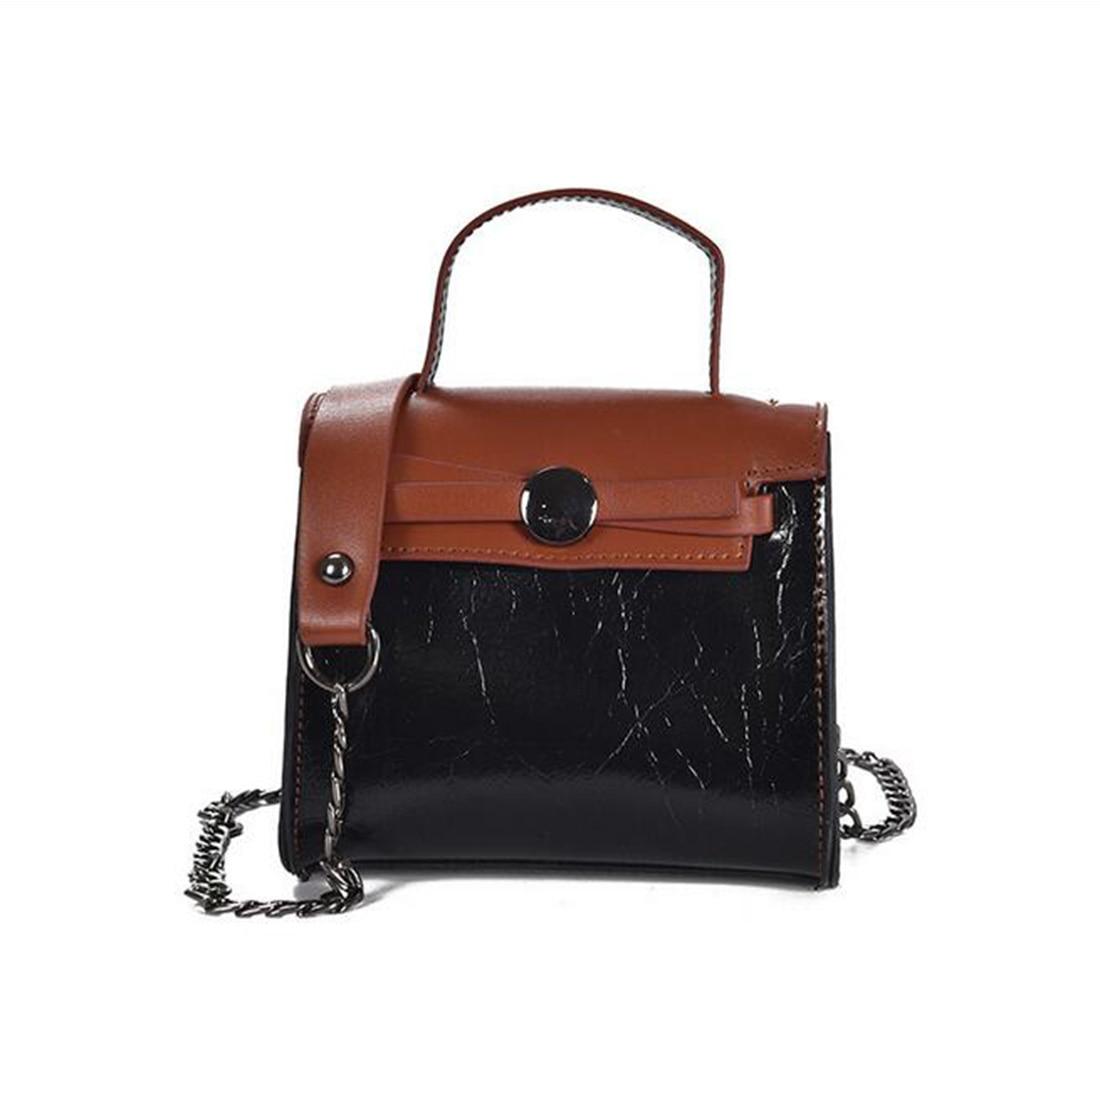 Famous Designer Handbags Bags Women Leather Handbag With Chain Strap Women Messenger Bags Bolsa Feminina Shop